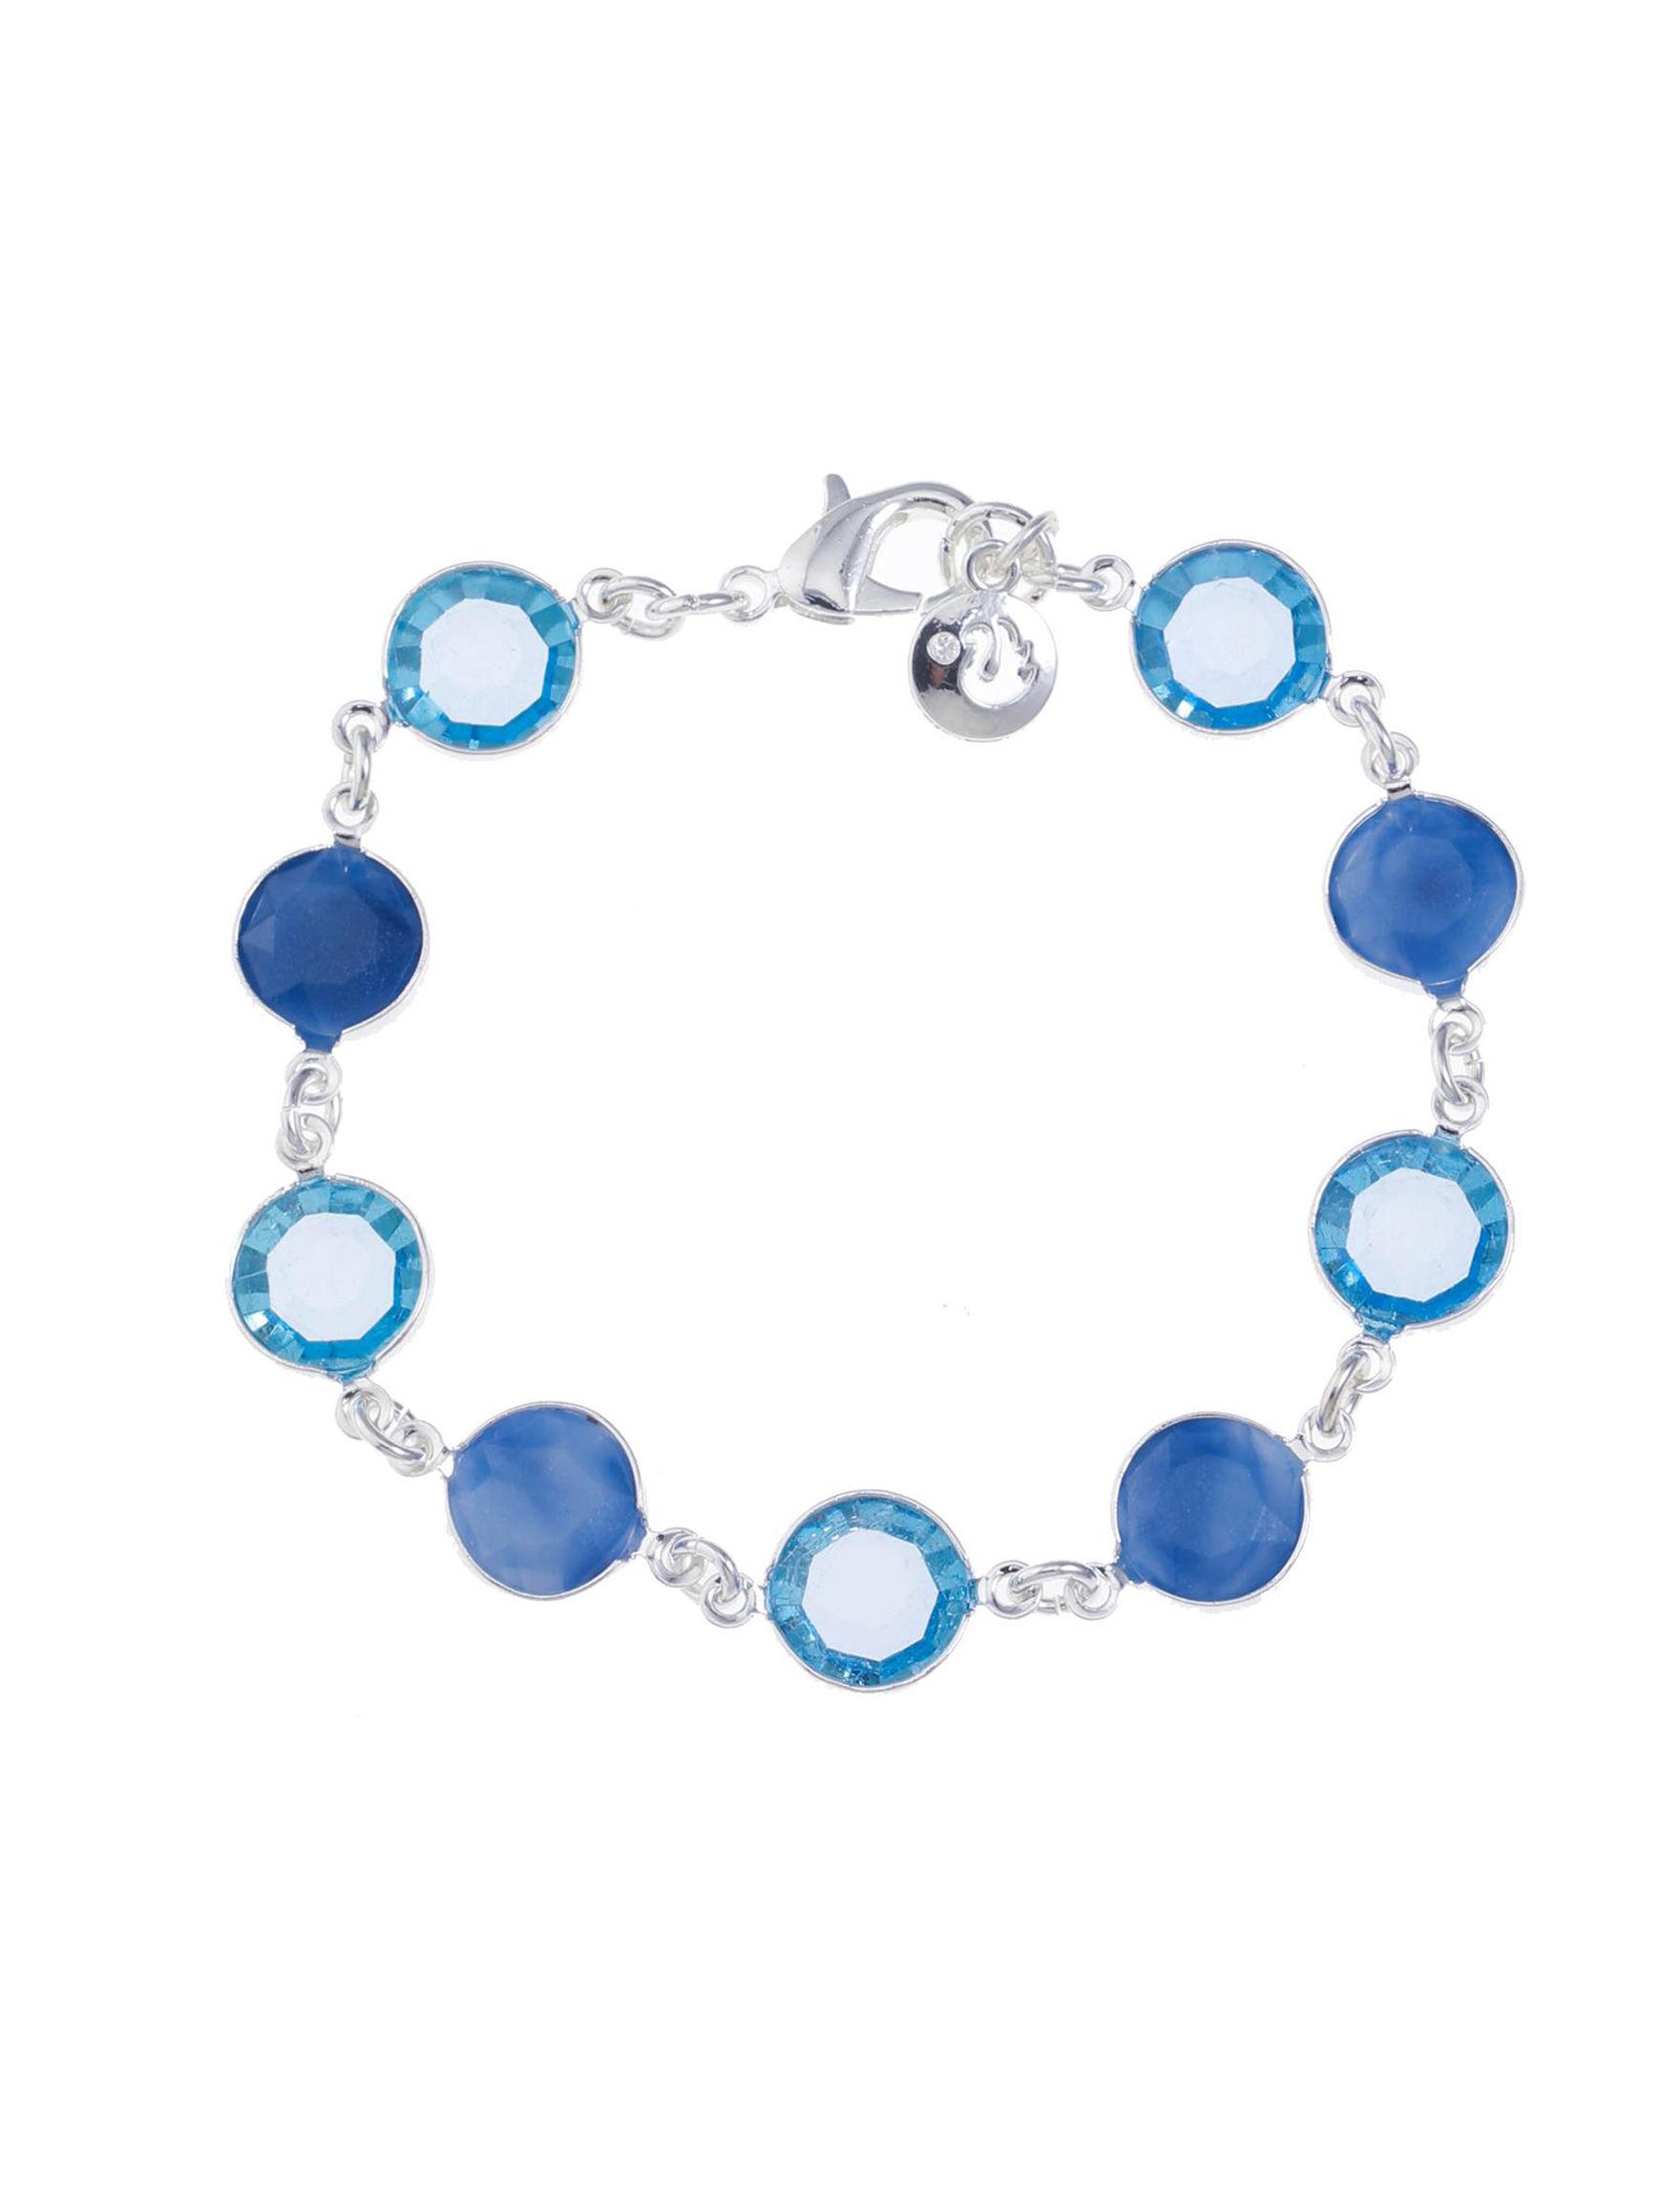 Gloria Vanderbilt Blue / Silver Bracelets Fashion Jewelry